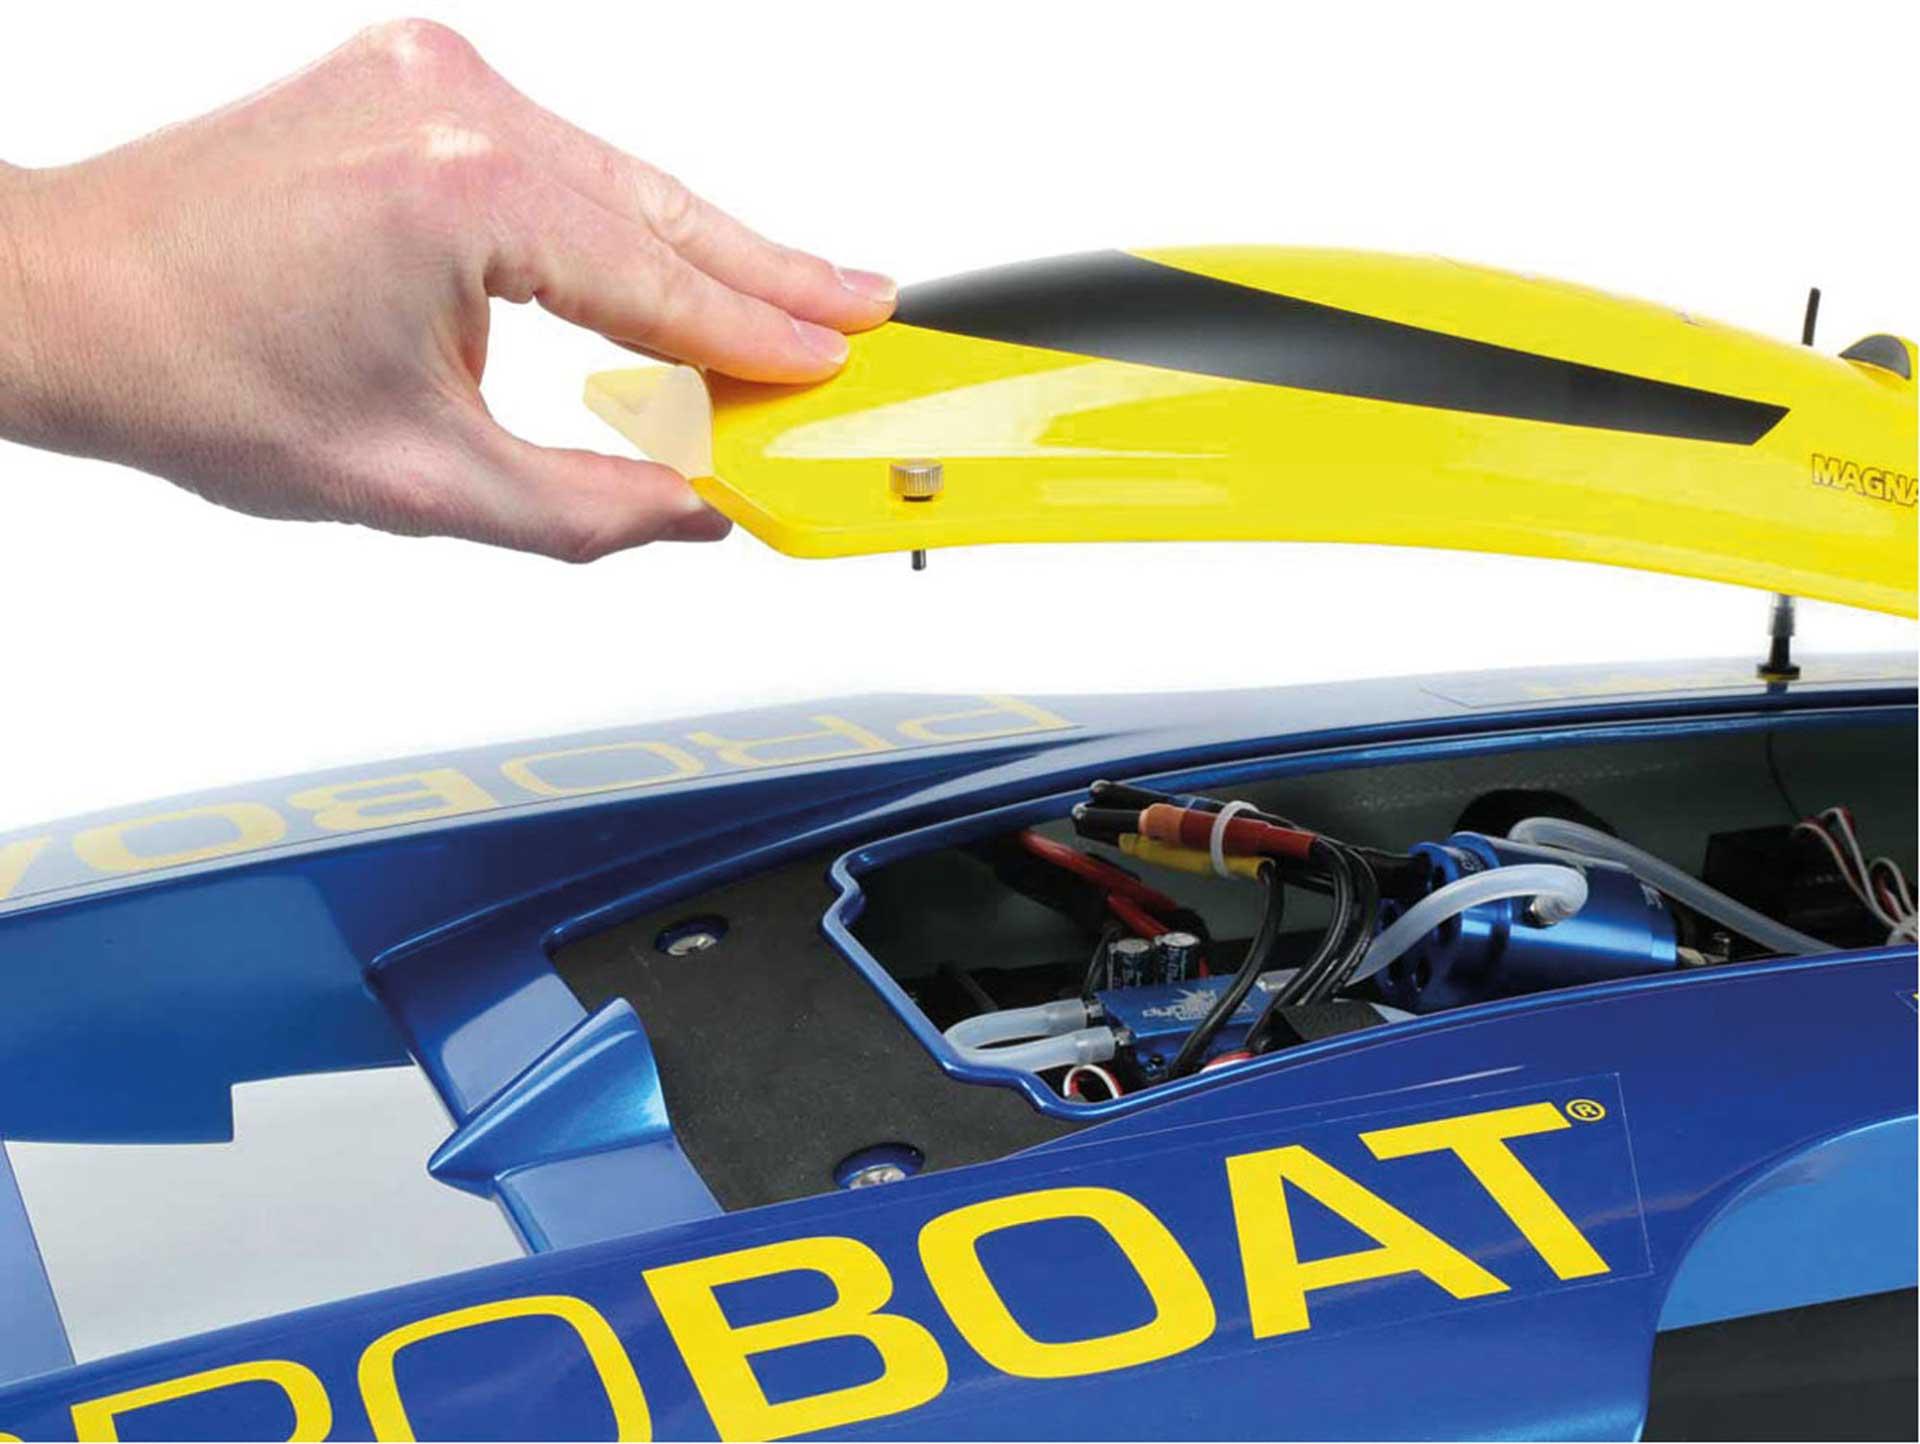 PROBOAT UL 19 30-INCH HYDROPLANE RACING BOAT RTR